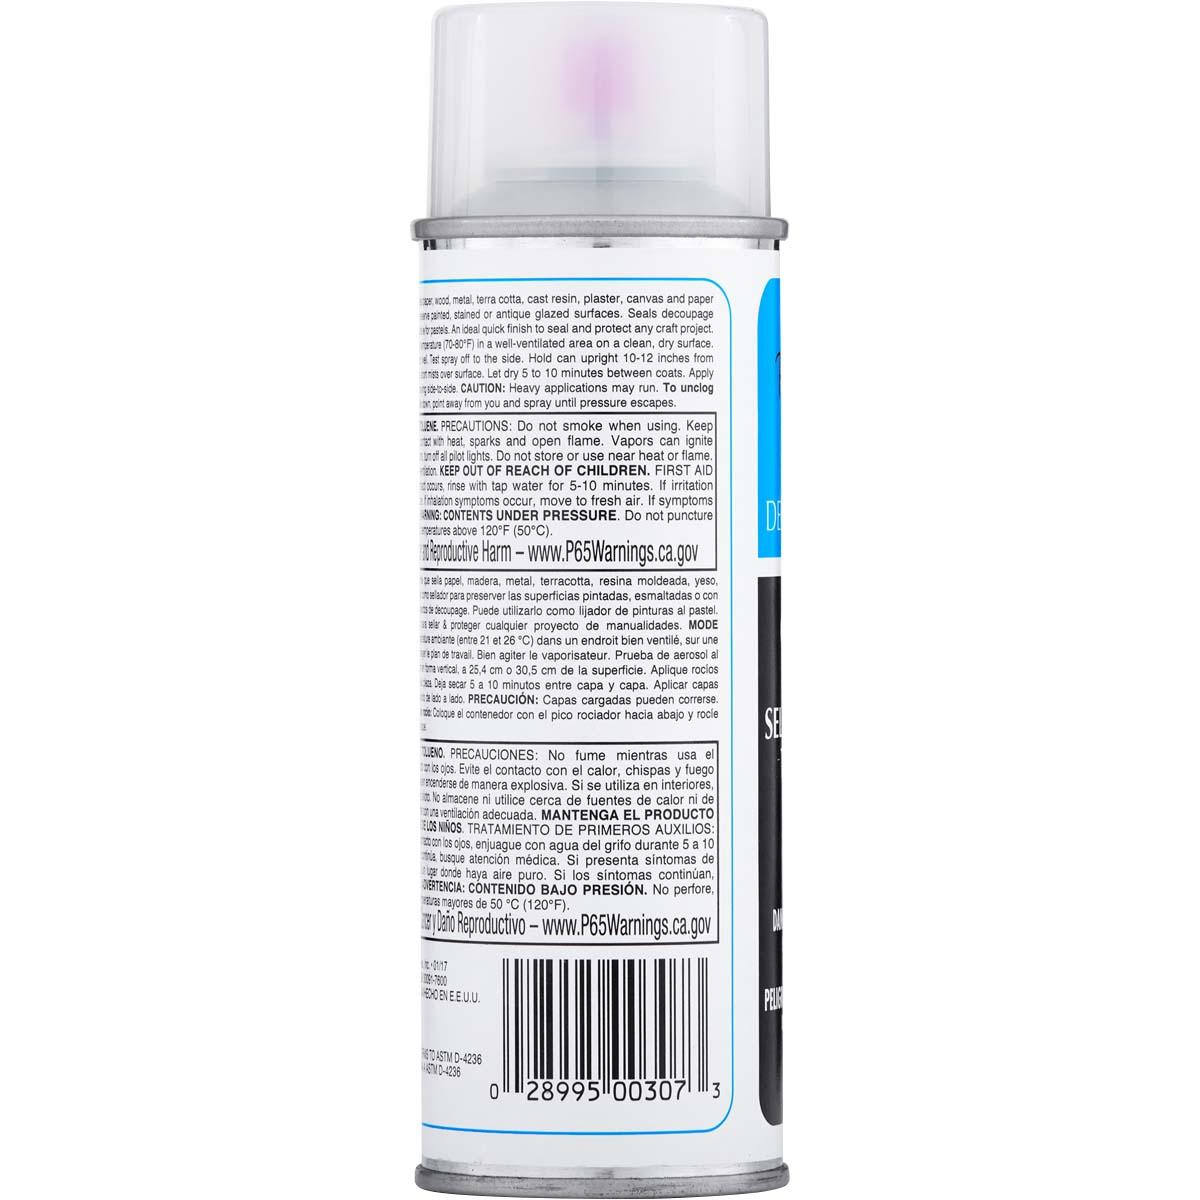 Plaid ® Patricia Nimocks™ Clear Acrylic Sealers - Matte, 6 oz. - CS200307